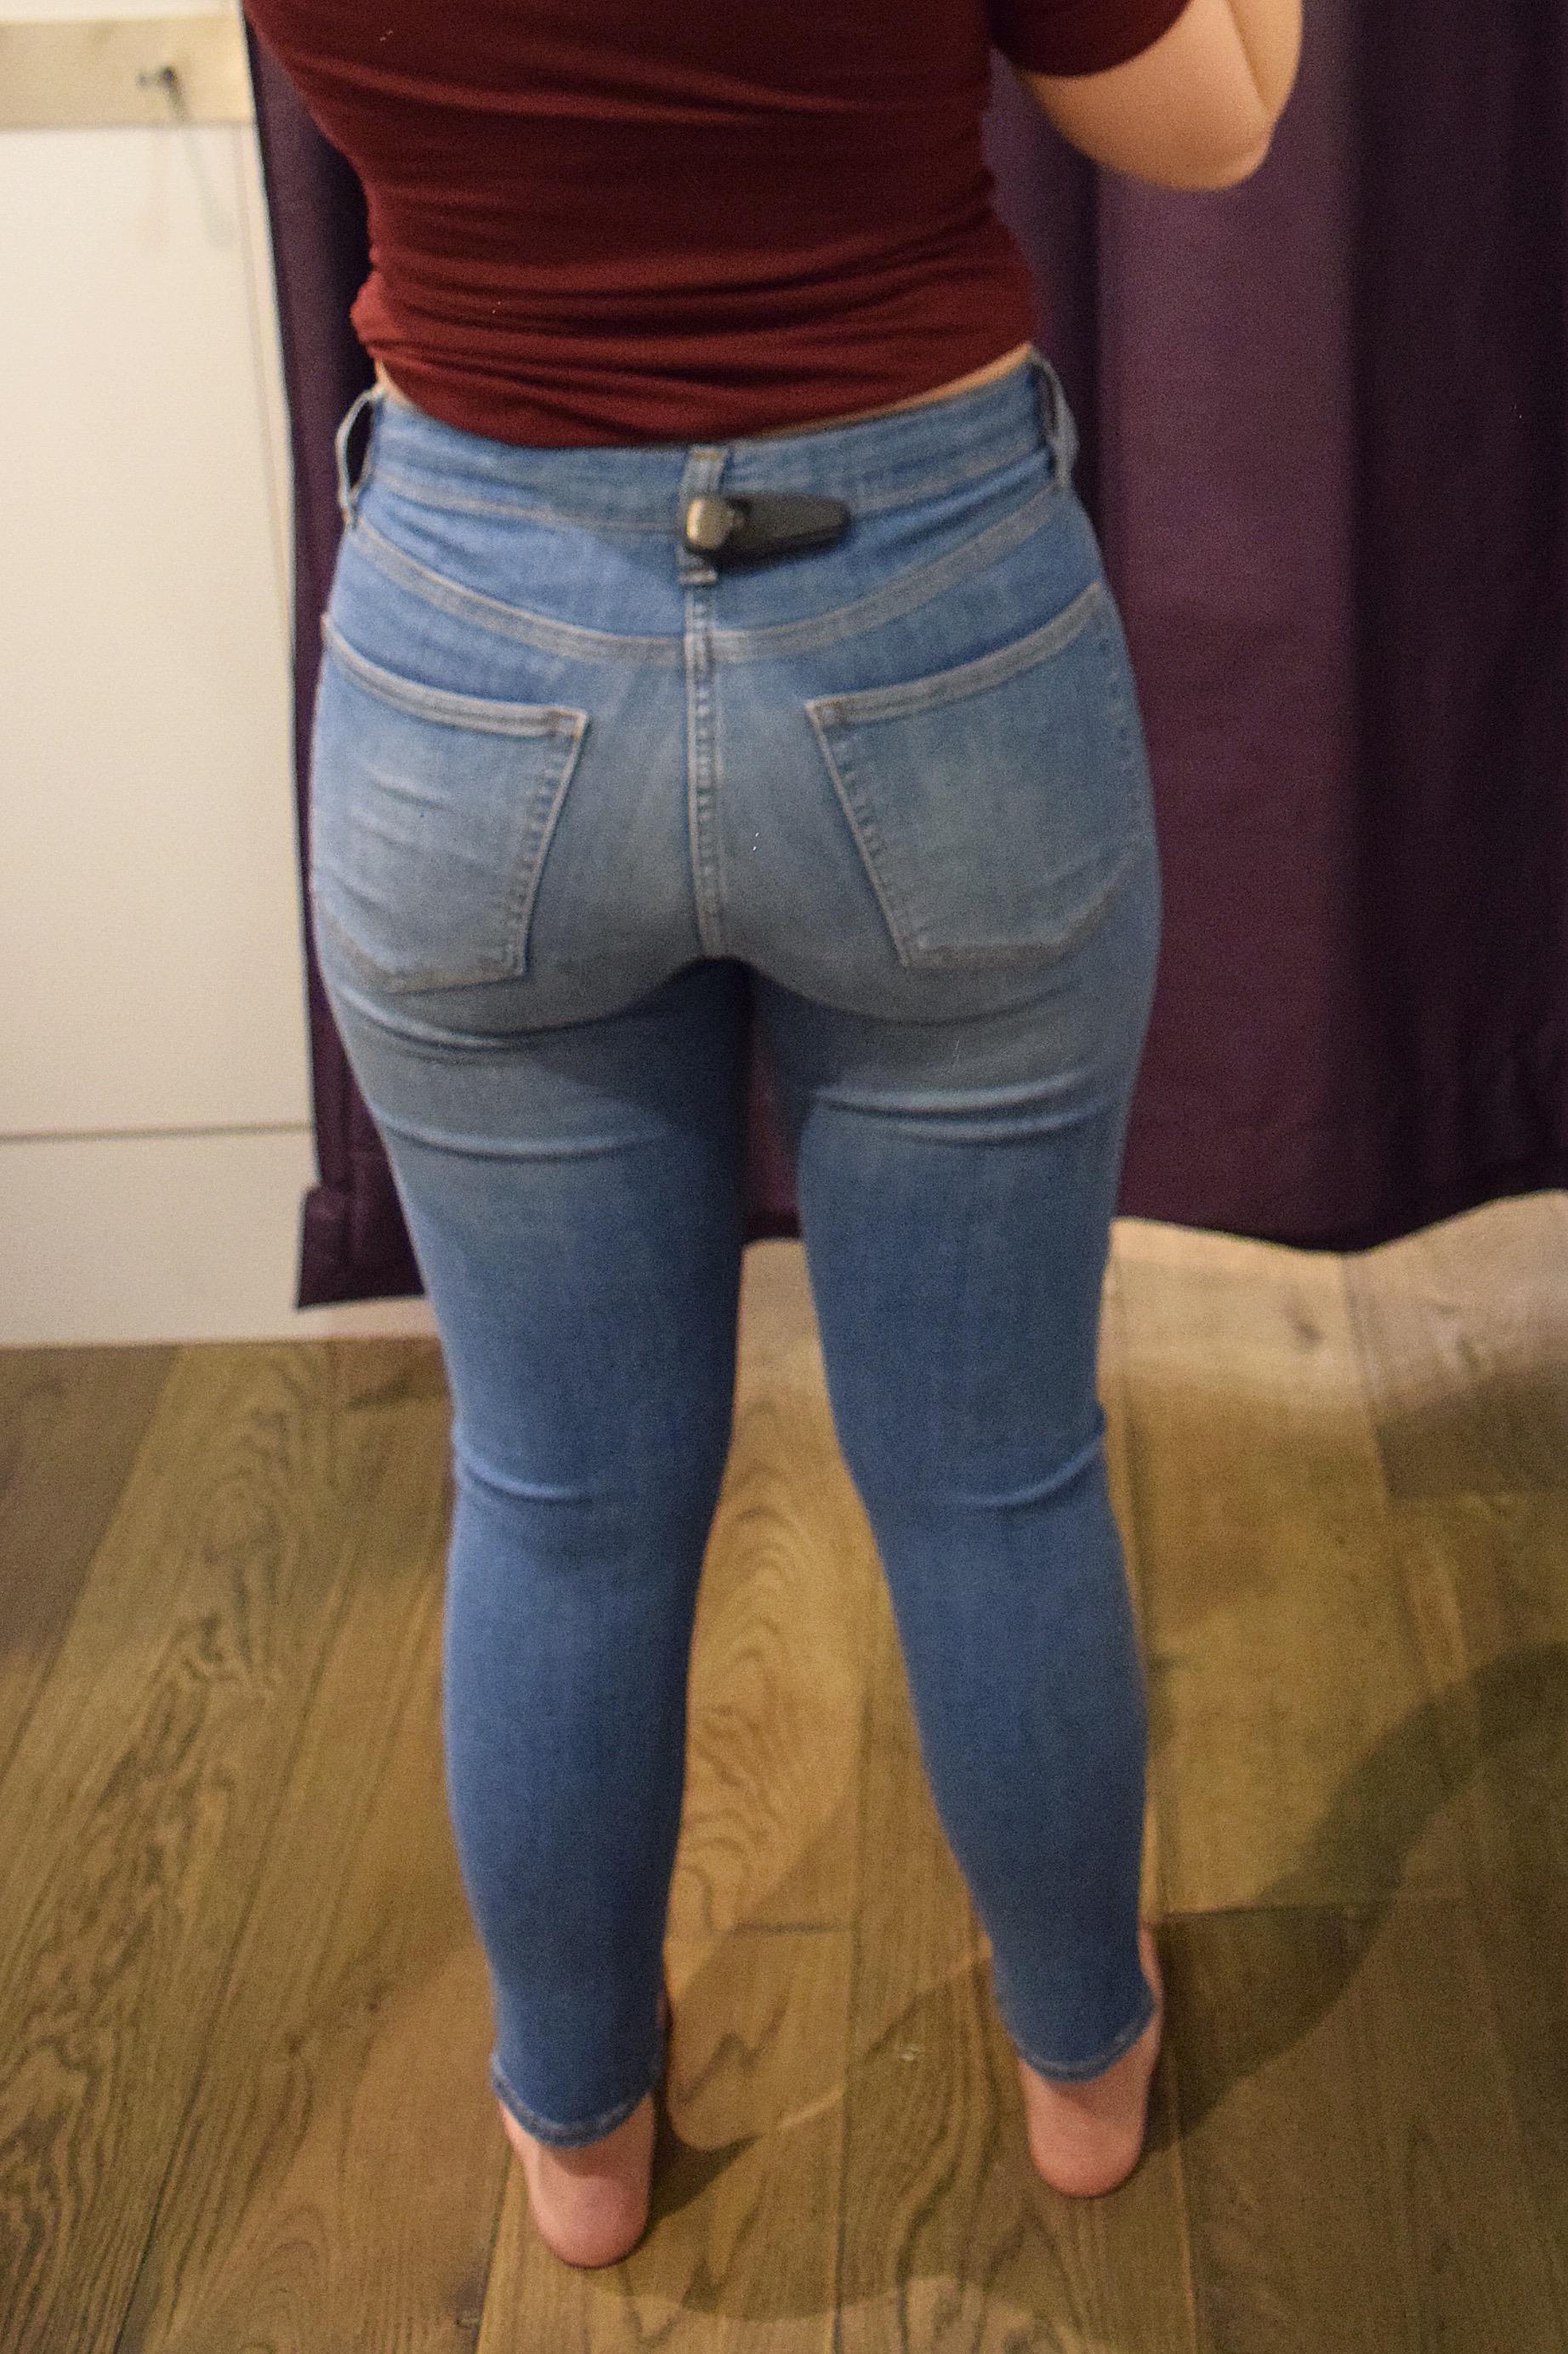 Topshop Petite Jamie High Waist Ankle Grazer - Size 6 Petite - Back View